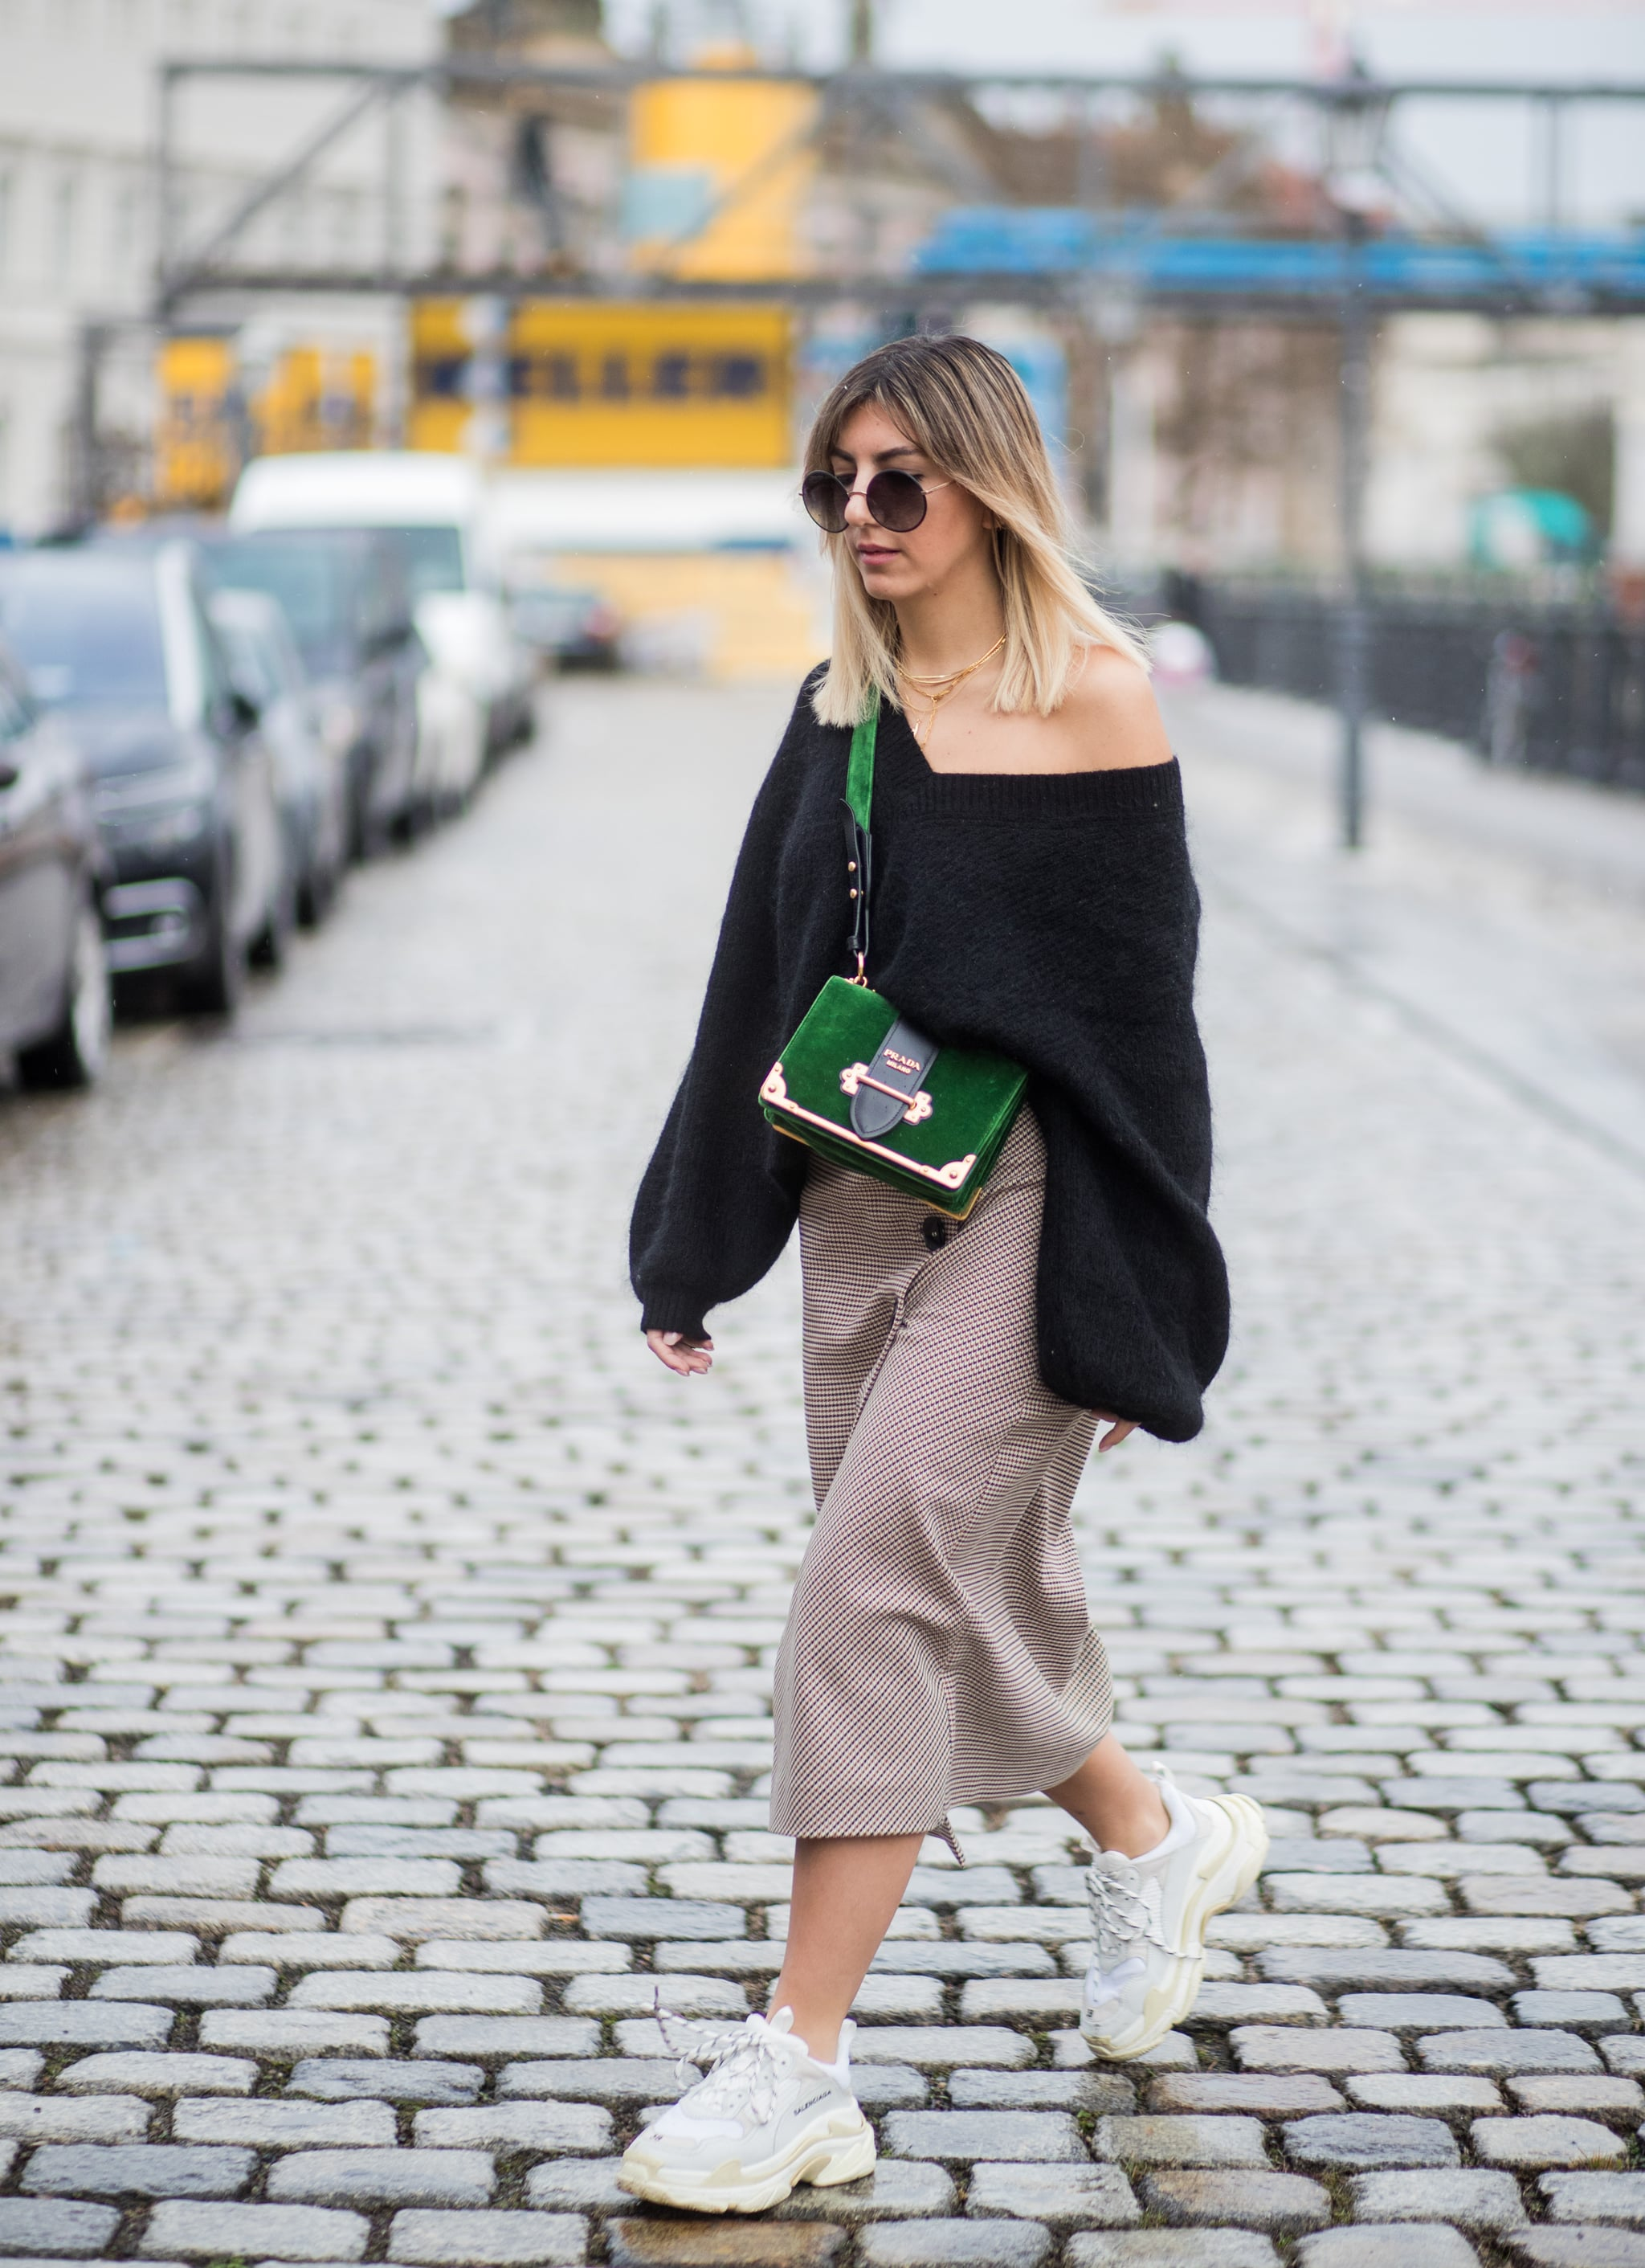 midi skirt and trainers